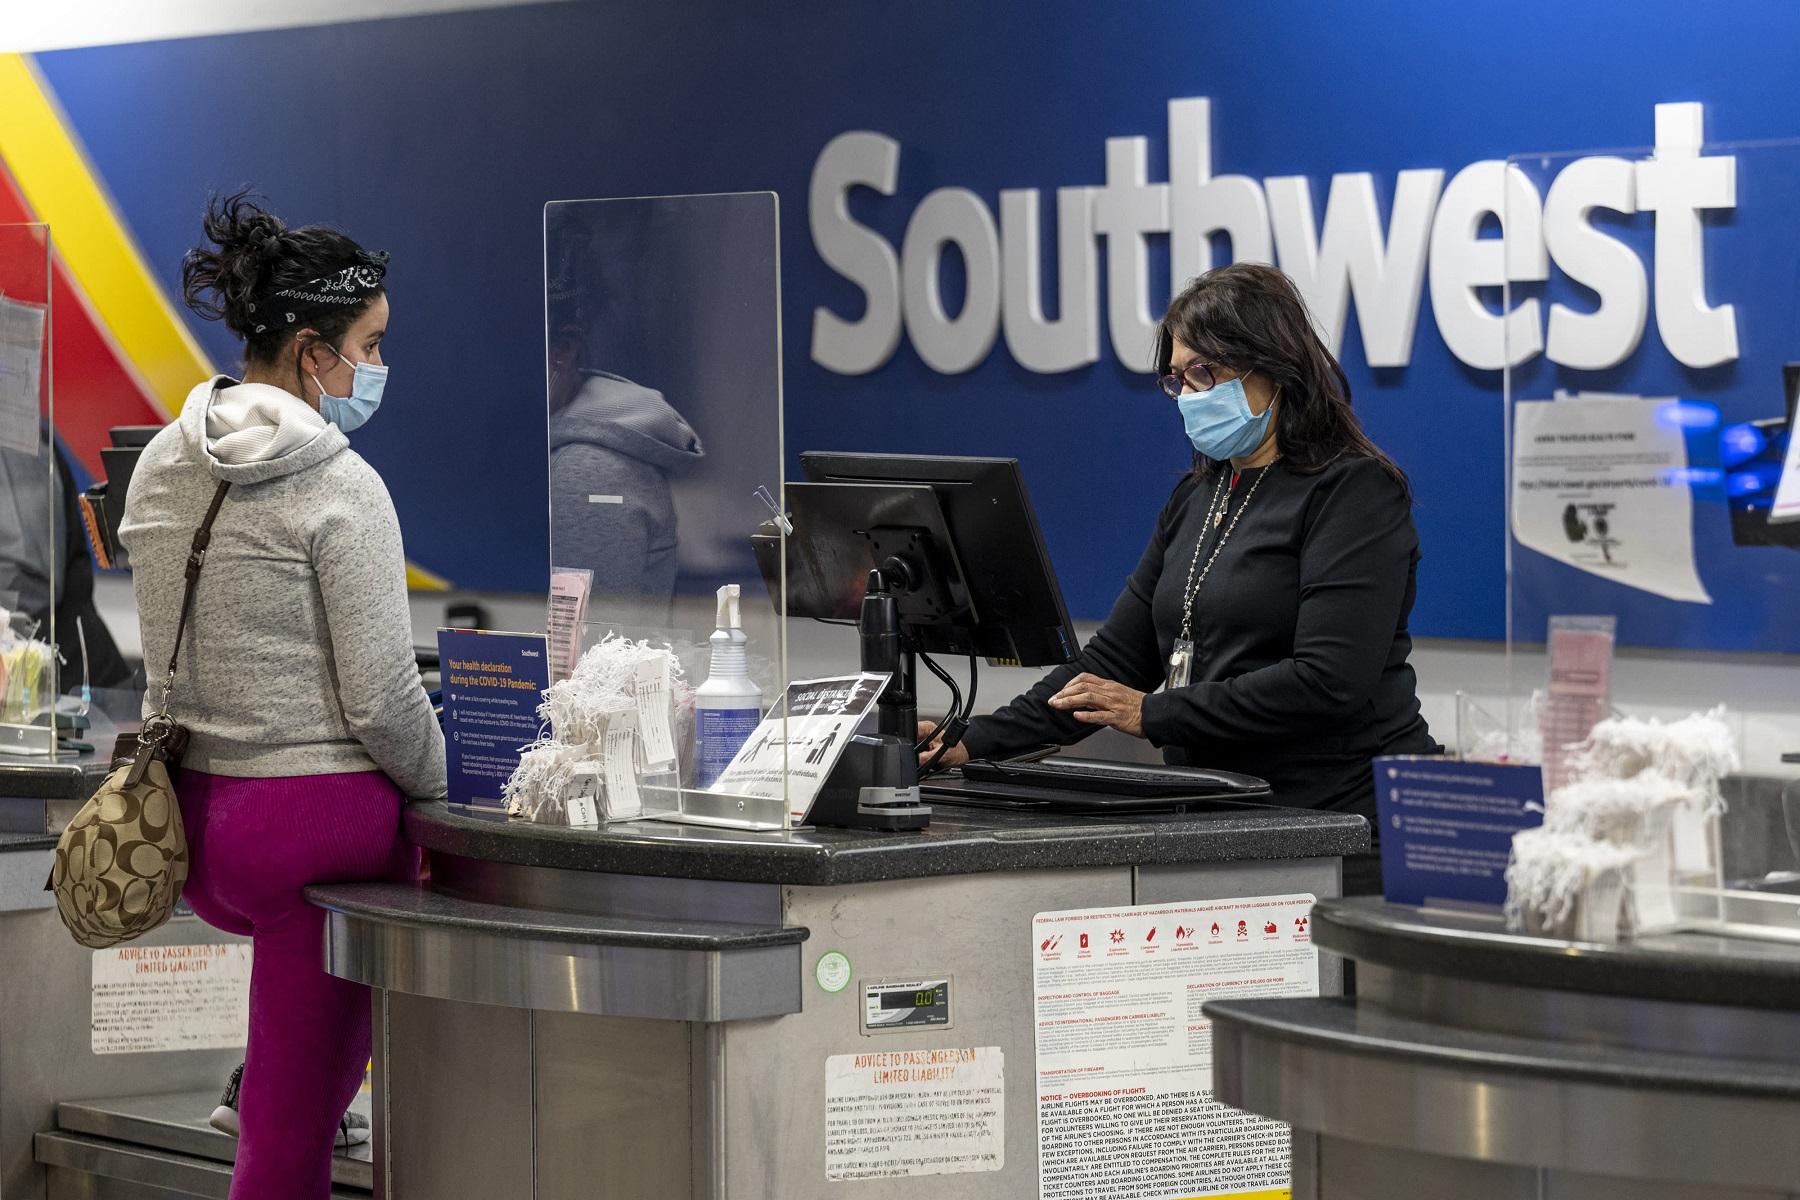 Southwest Airlines: Προσφέρει επιπλέον αμοιβή σε εργαζόμενους που εμβολιάζονται